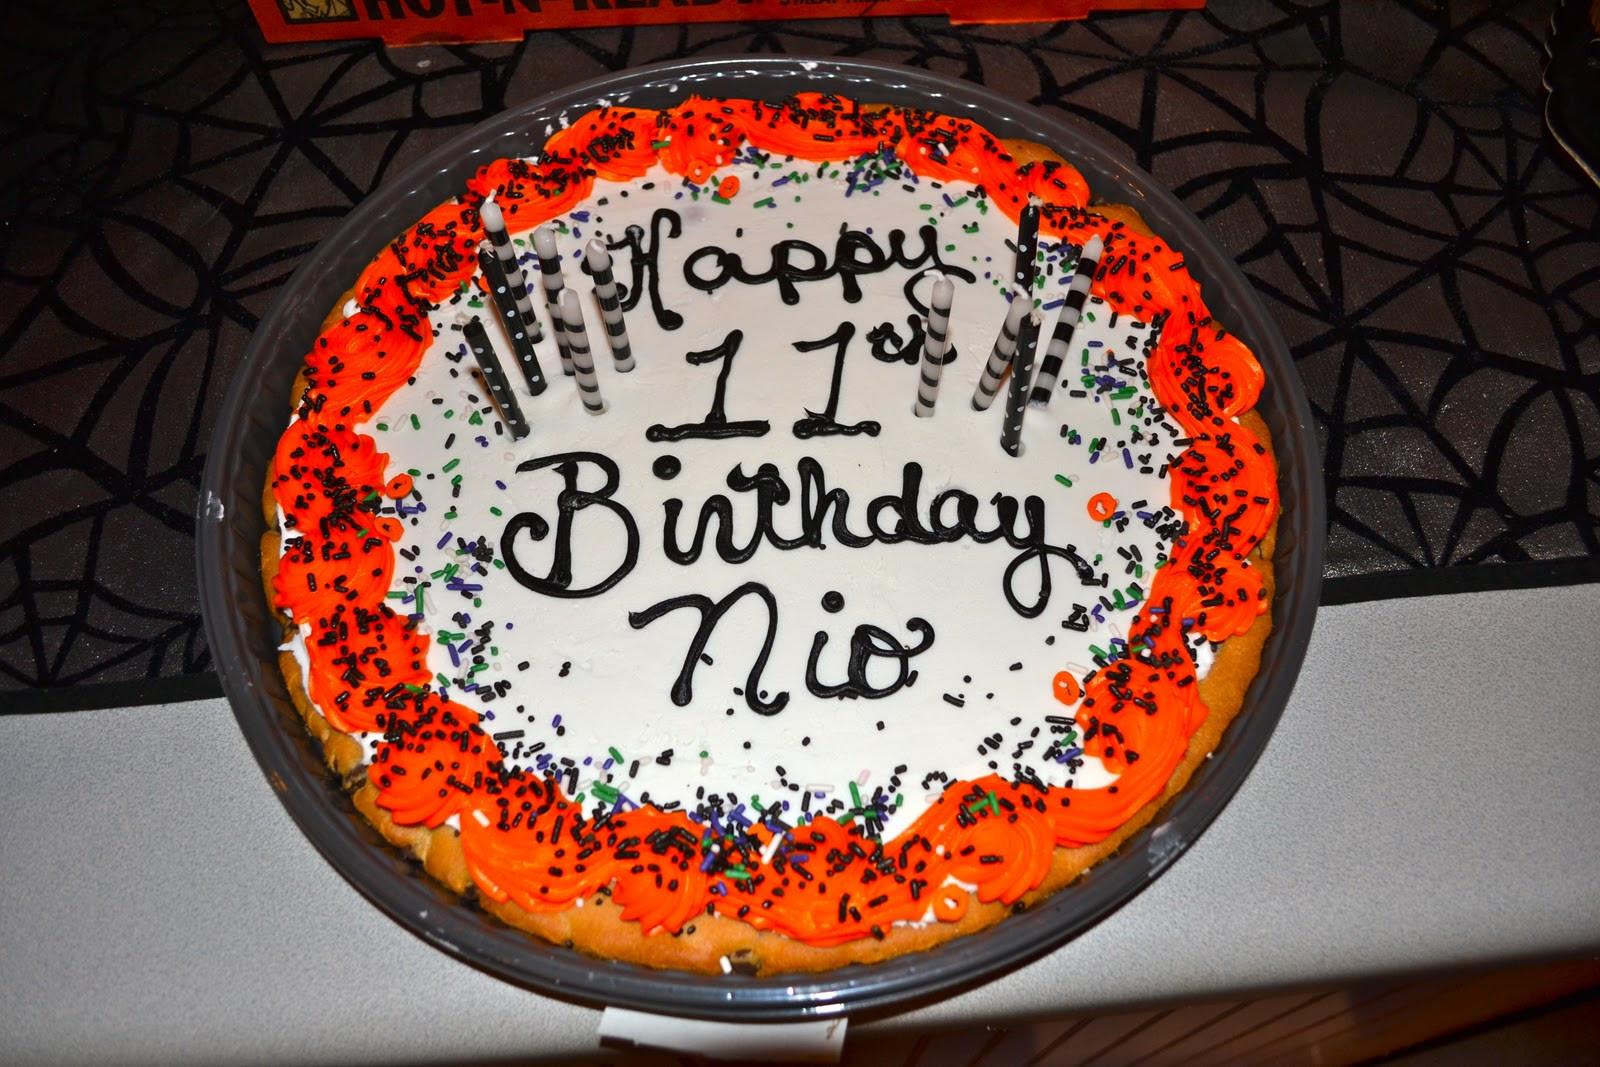 Halloween Cakes At Walmart  Life & Home at 2102 Nio s 11th Halloween Birthday Party